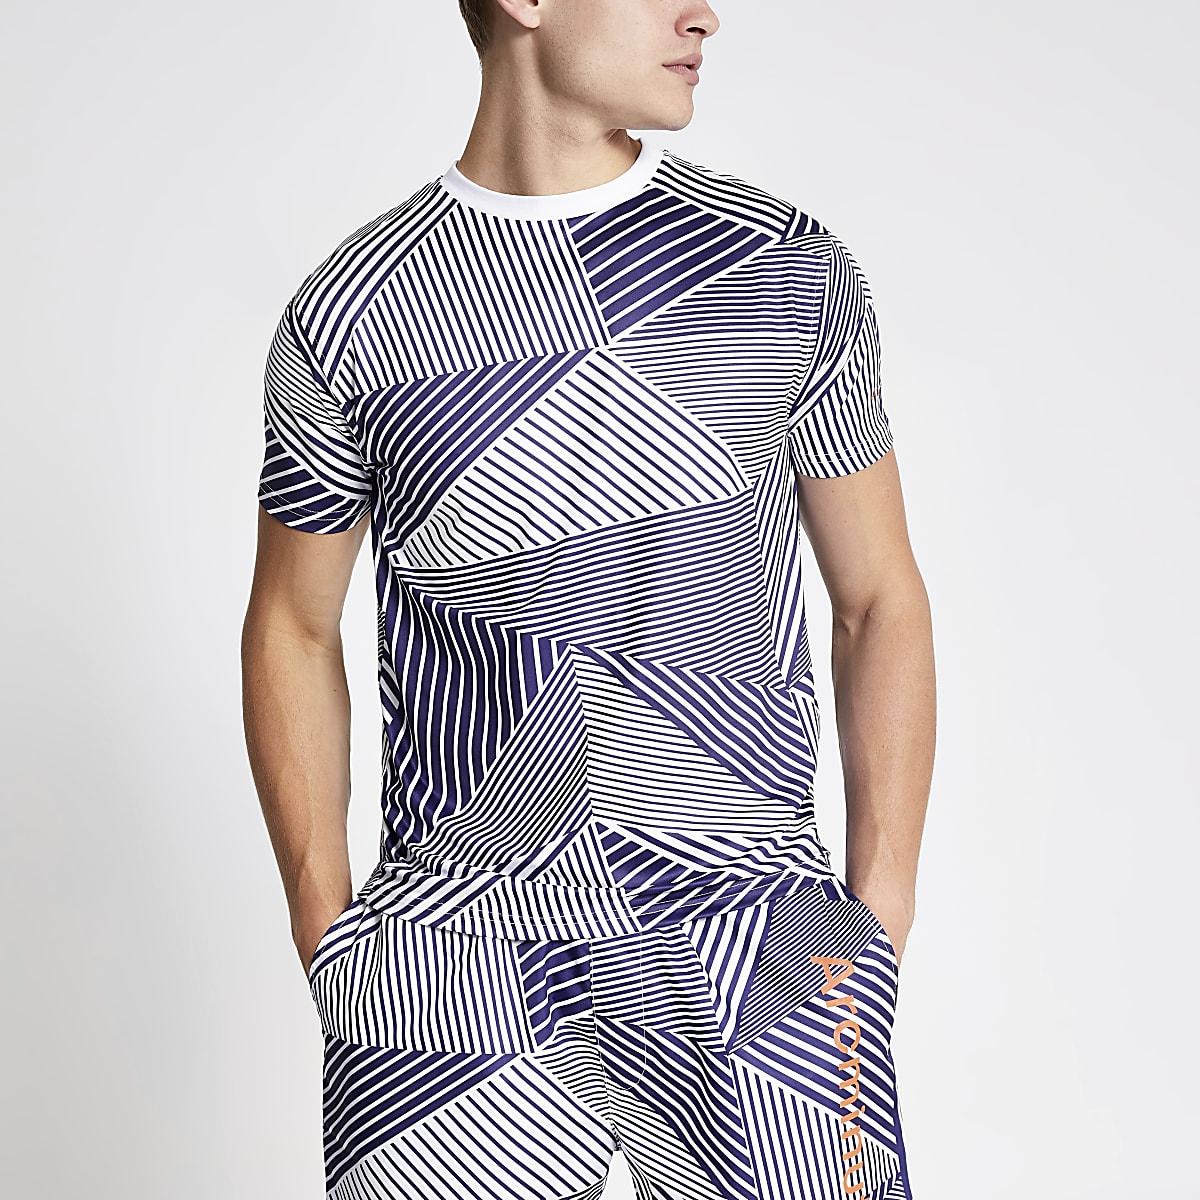 Arcminute – Blaues T-Shirt mit Print